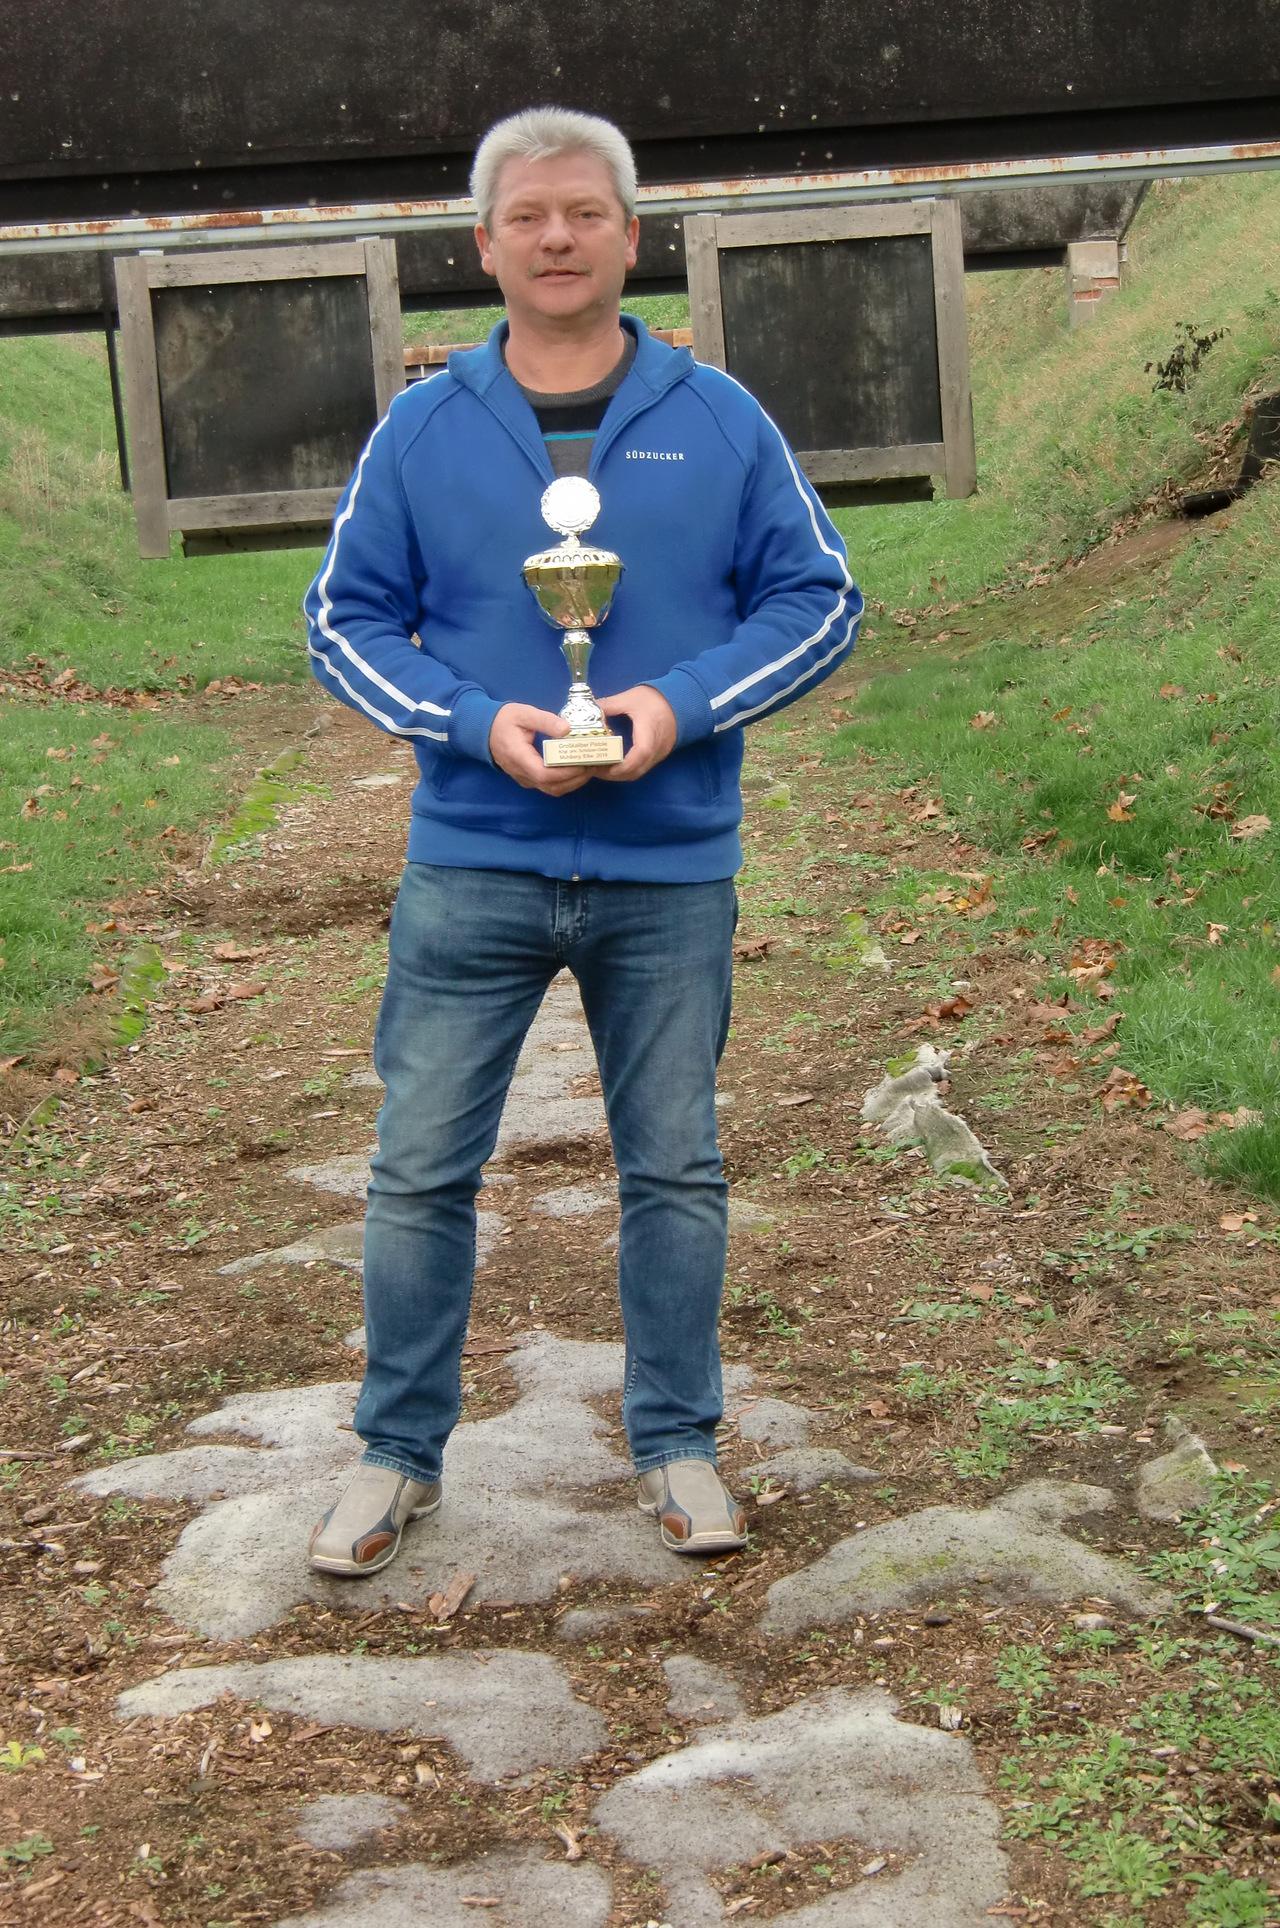 2019 Pokalgewinner Grosskaliberpistole